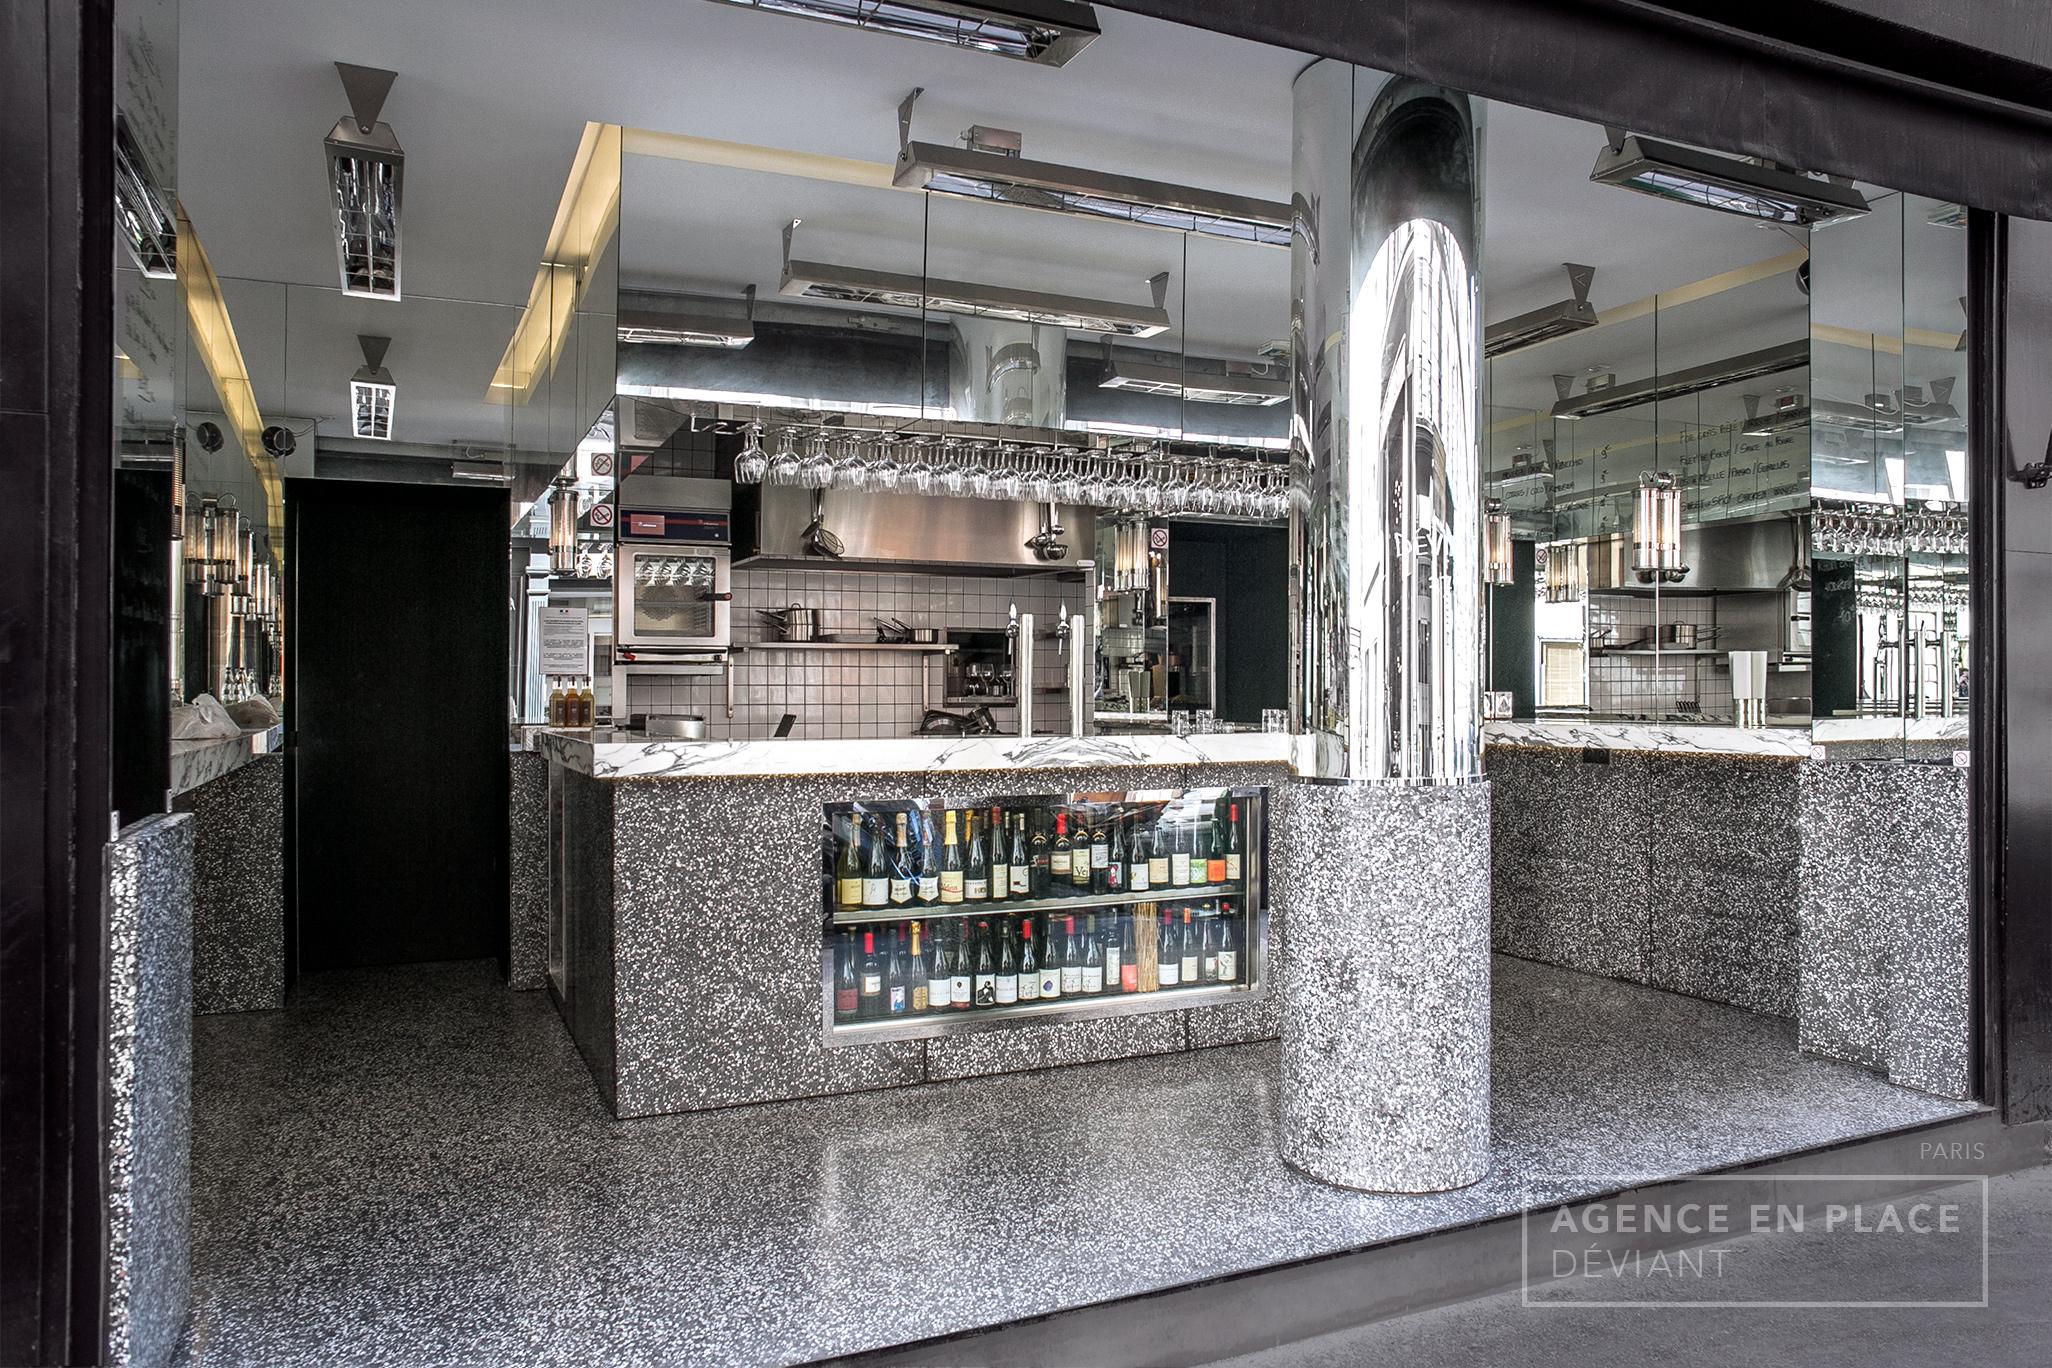 deviant-agenceenplace-winebar-001